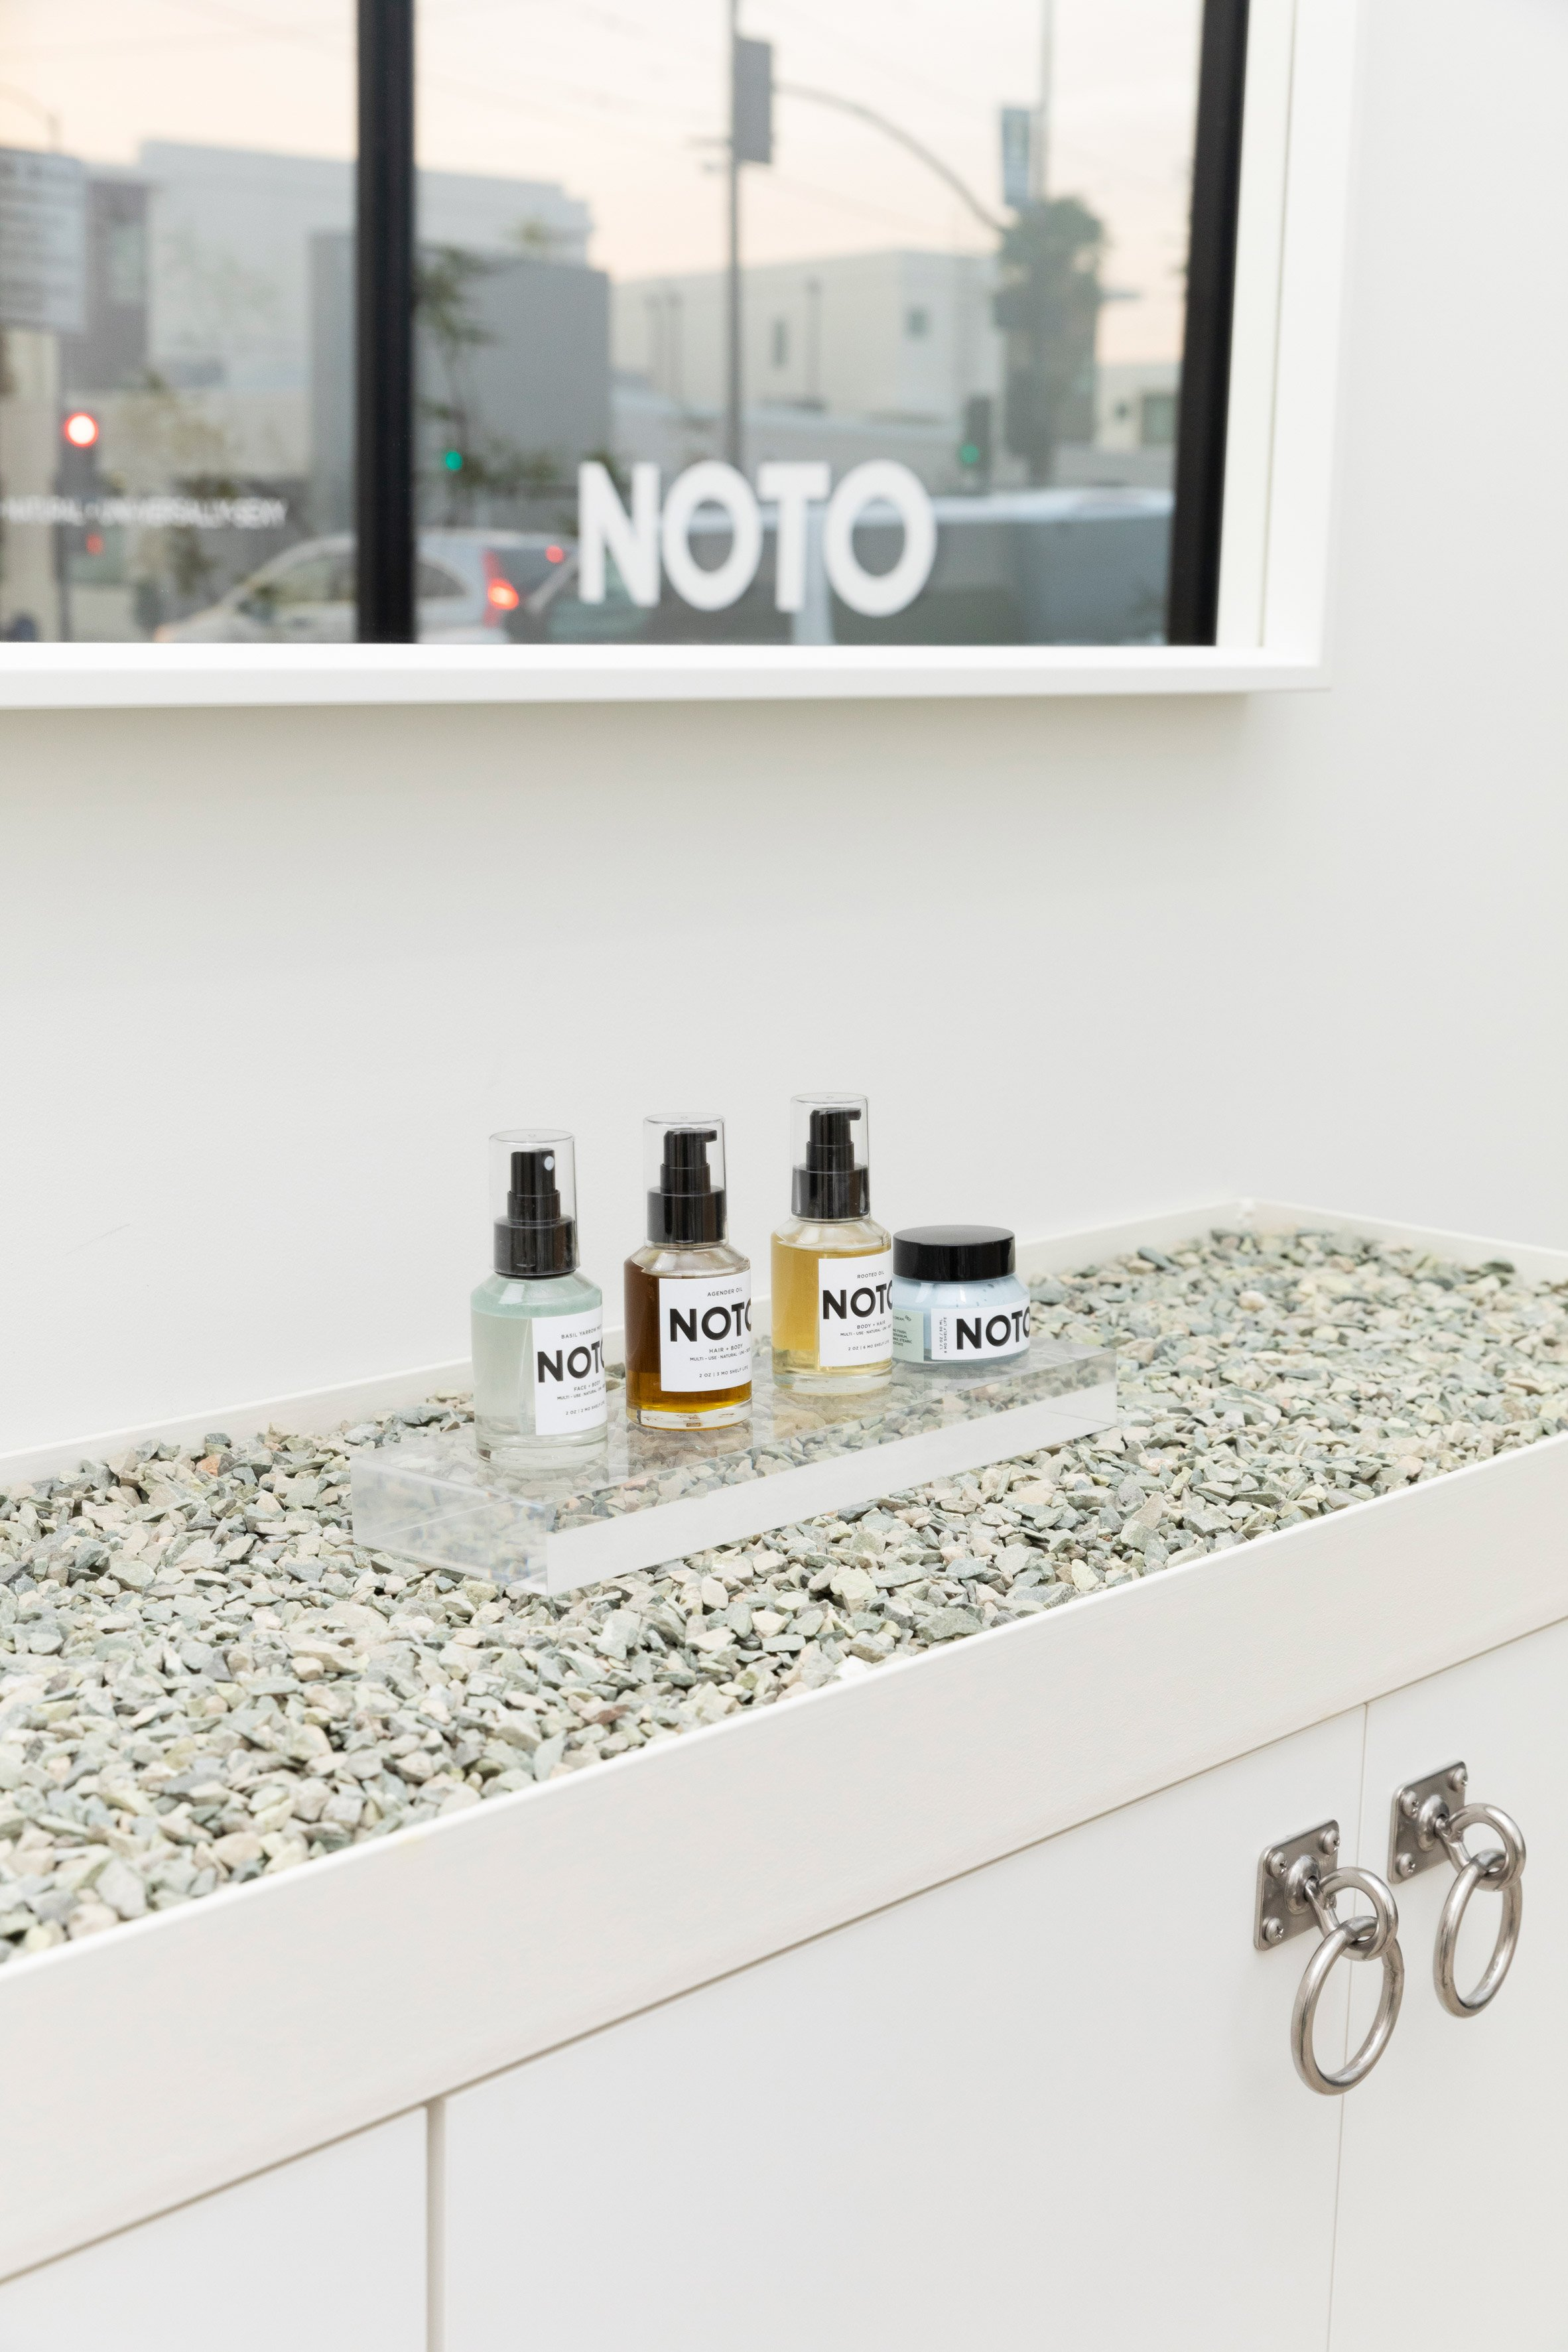 Noto Botanics Store by Venn Studio